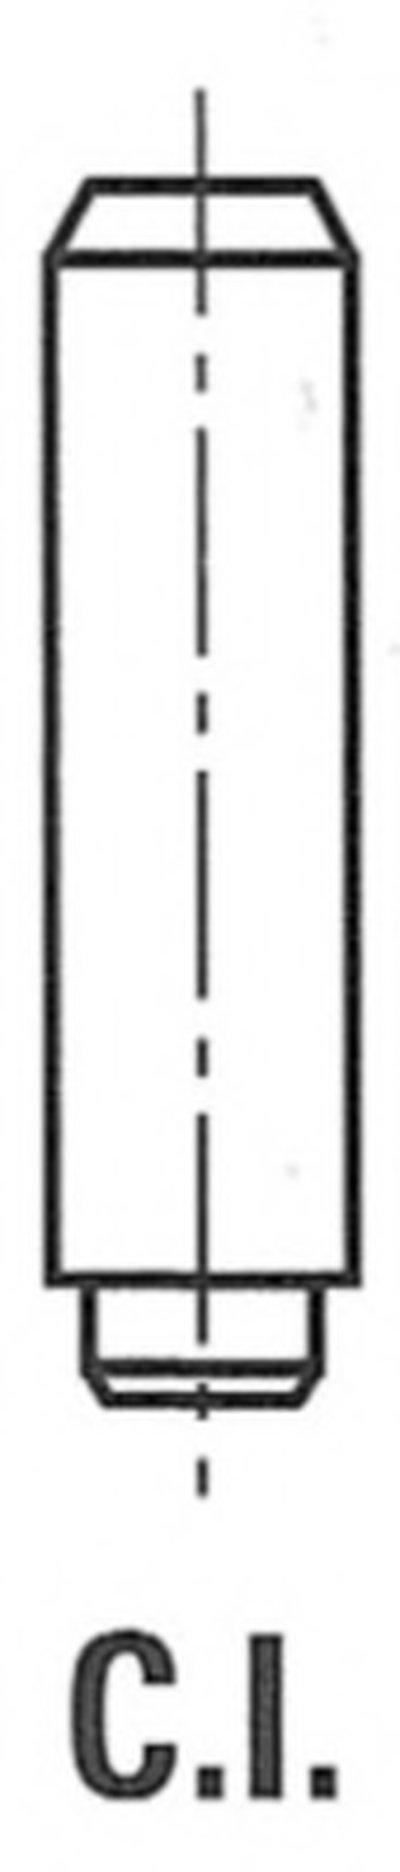 VG11302SM BGA Направляющая втулка клапана